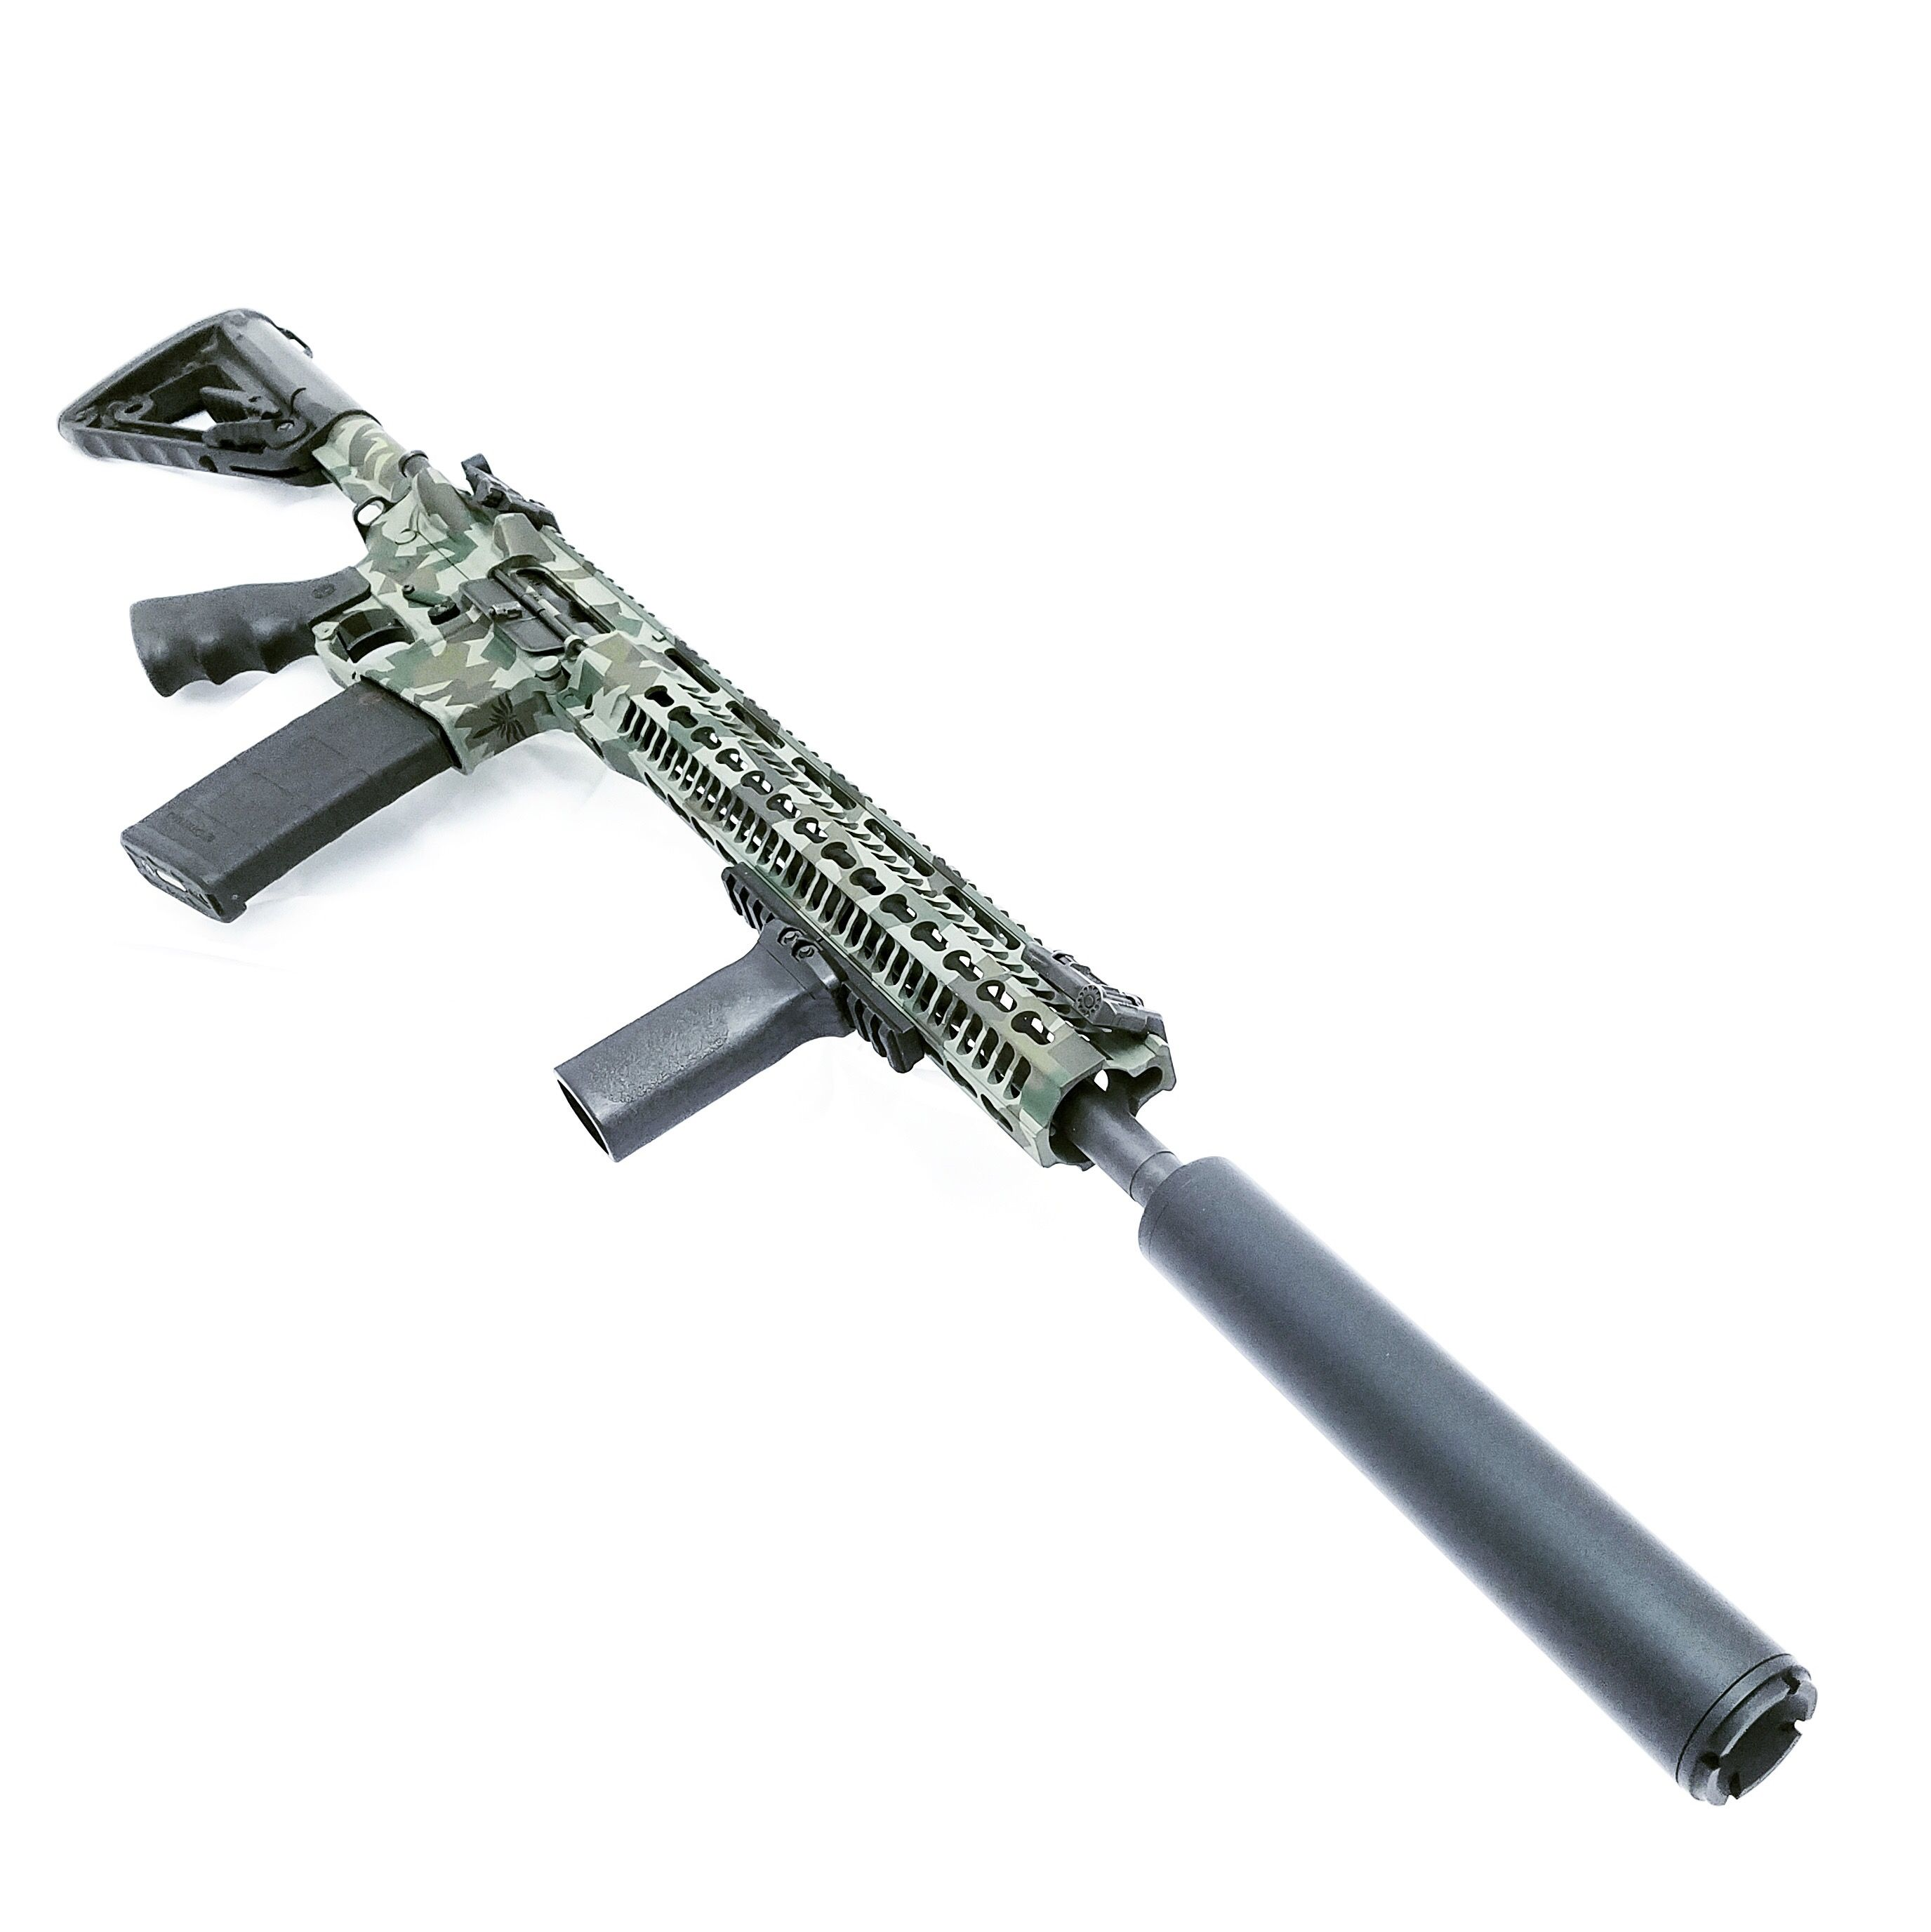 Black Aces Tactical Po' Boy AR15 Suppressor | Weapons | Guns